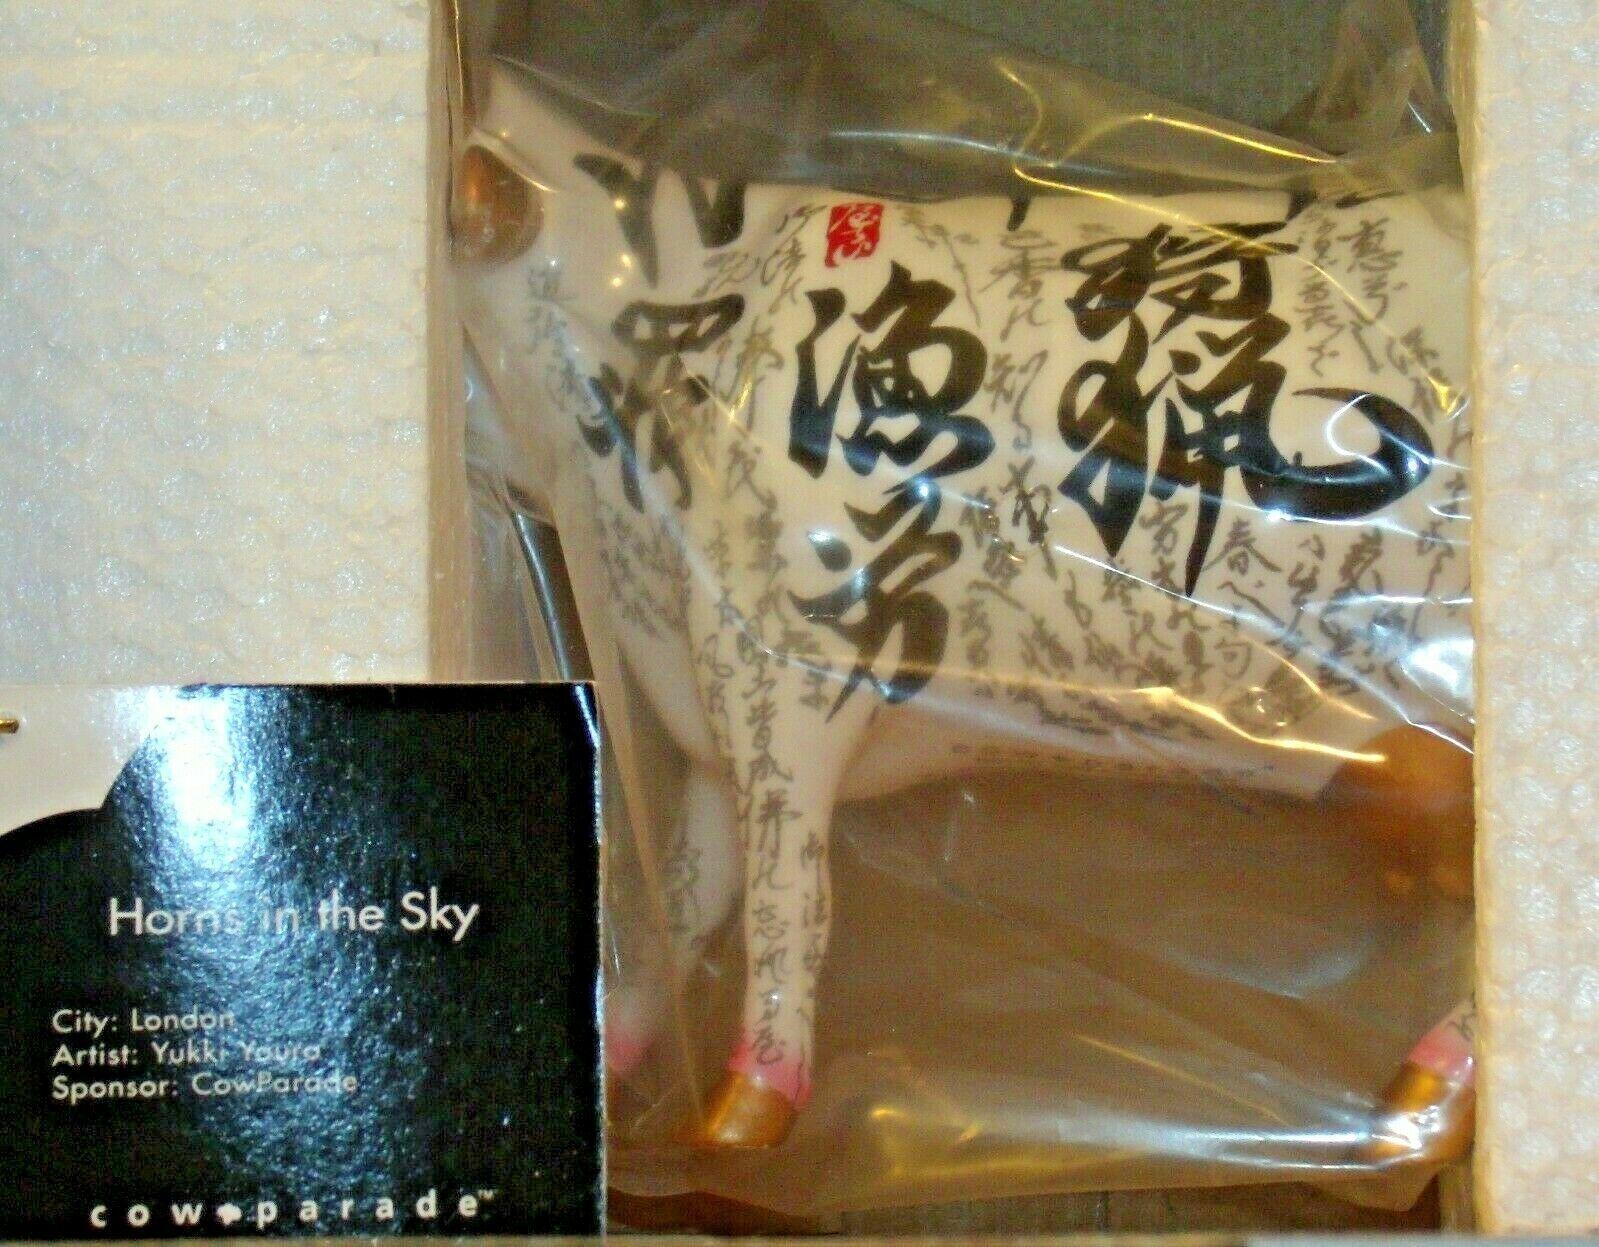 CowParade Horns In The Sky Westland Giftware # 7327 AA-191913 Vintage Collectib